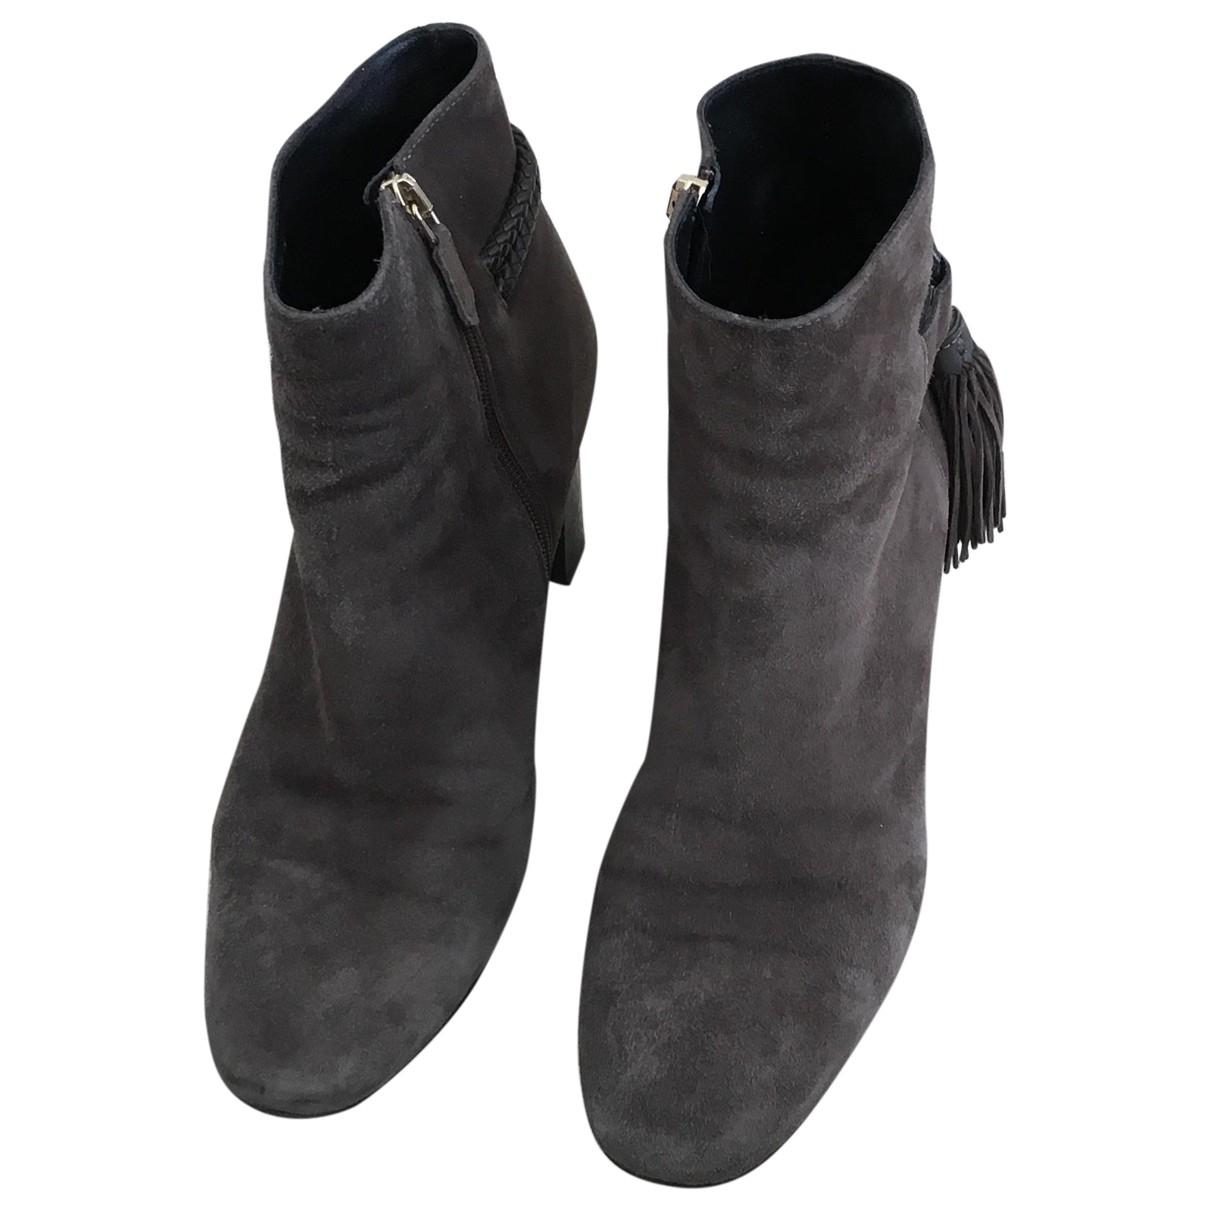 Lk Bennett \N Suede Ankle boots for Women 38 EU